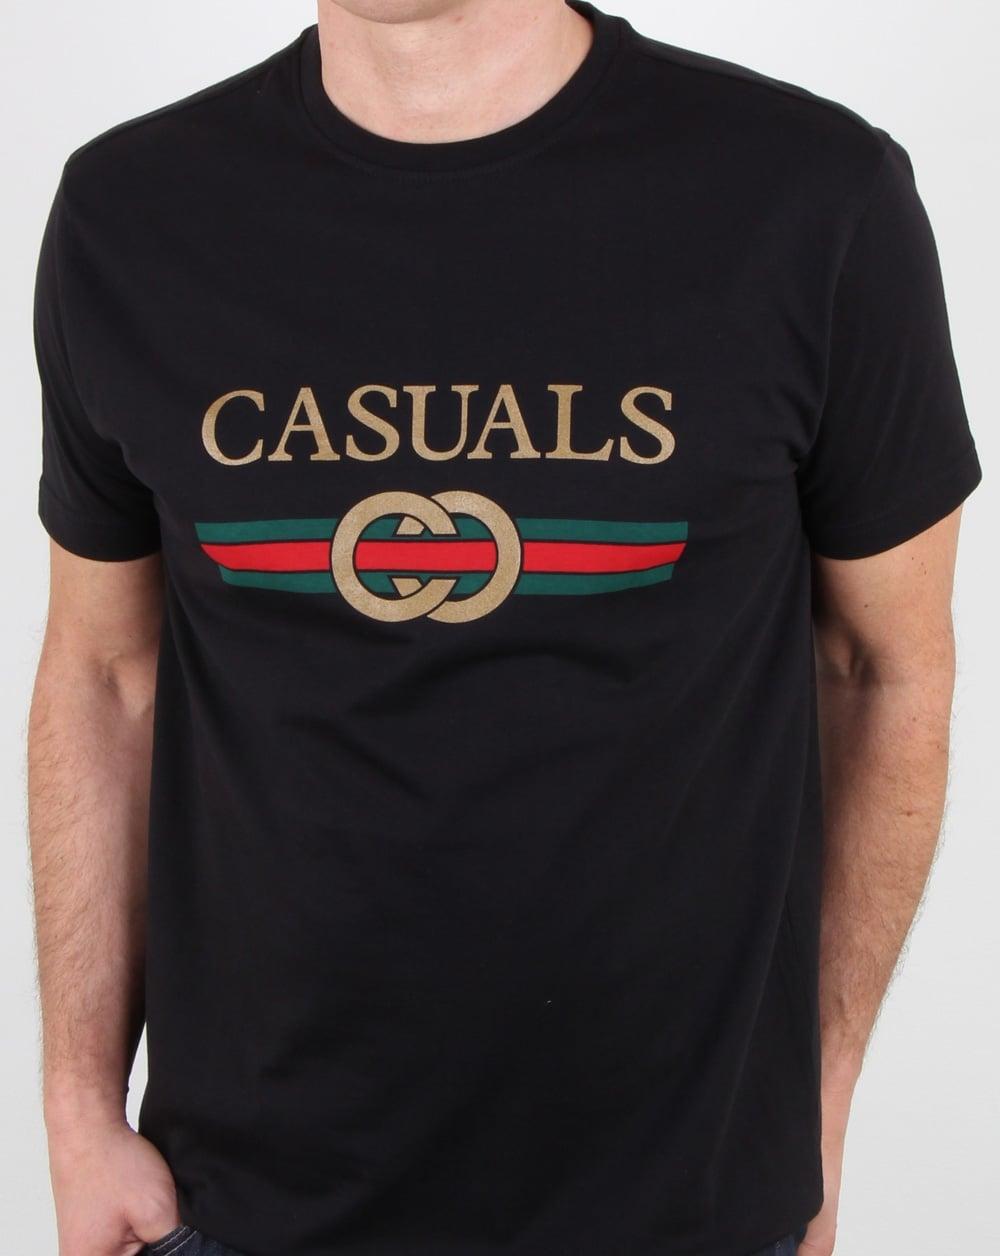 designer casual t-shirt gucci